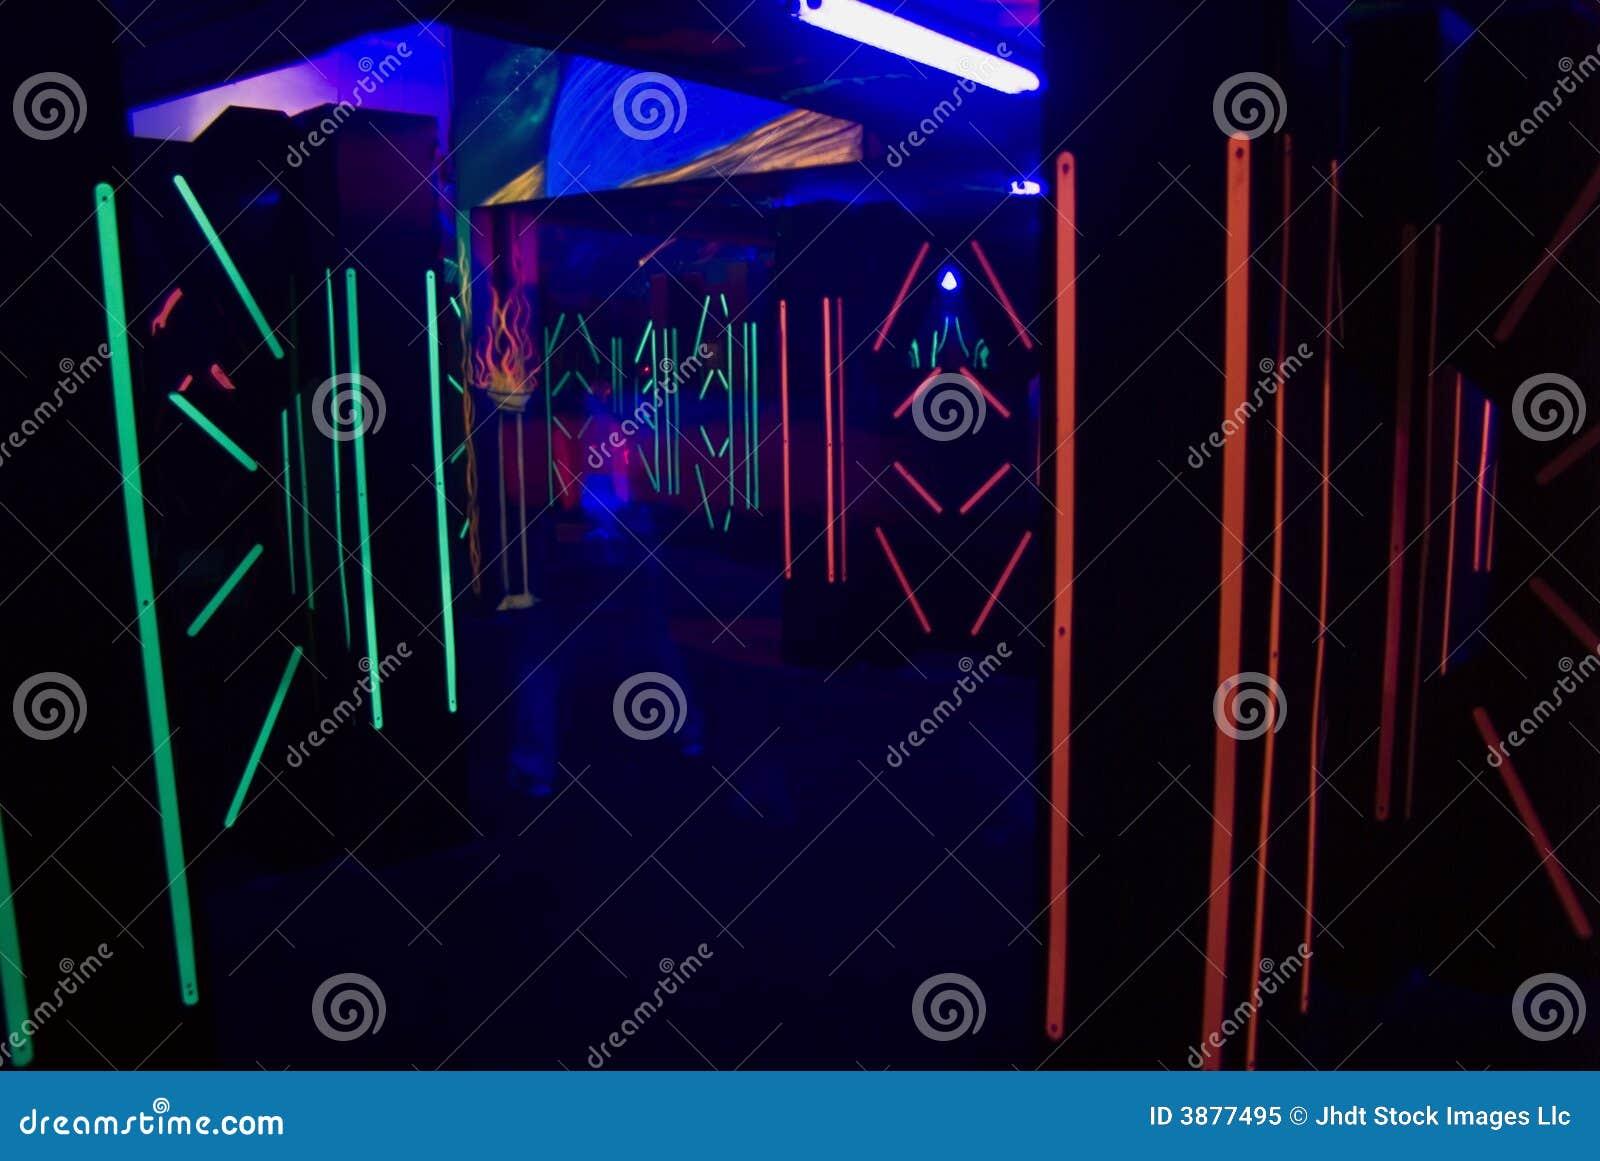 Laser Tag Anyone Stock Image Image Of Play Laser